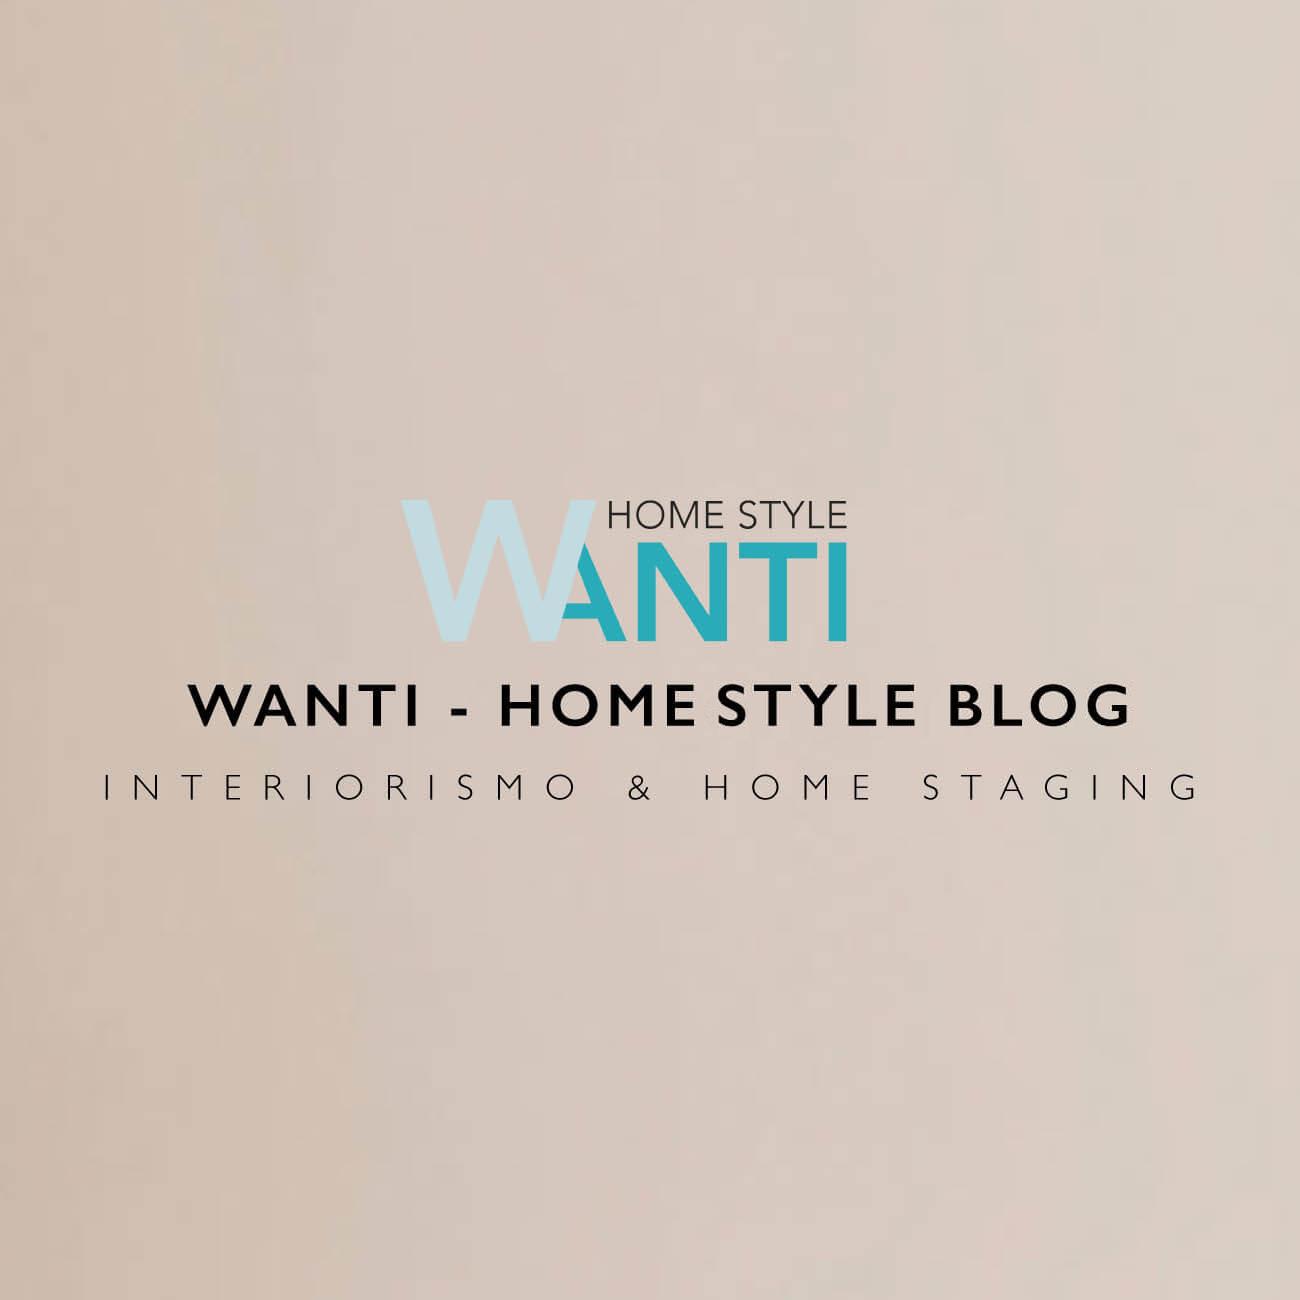 Wanti Home Style Blog